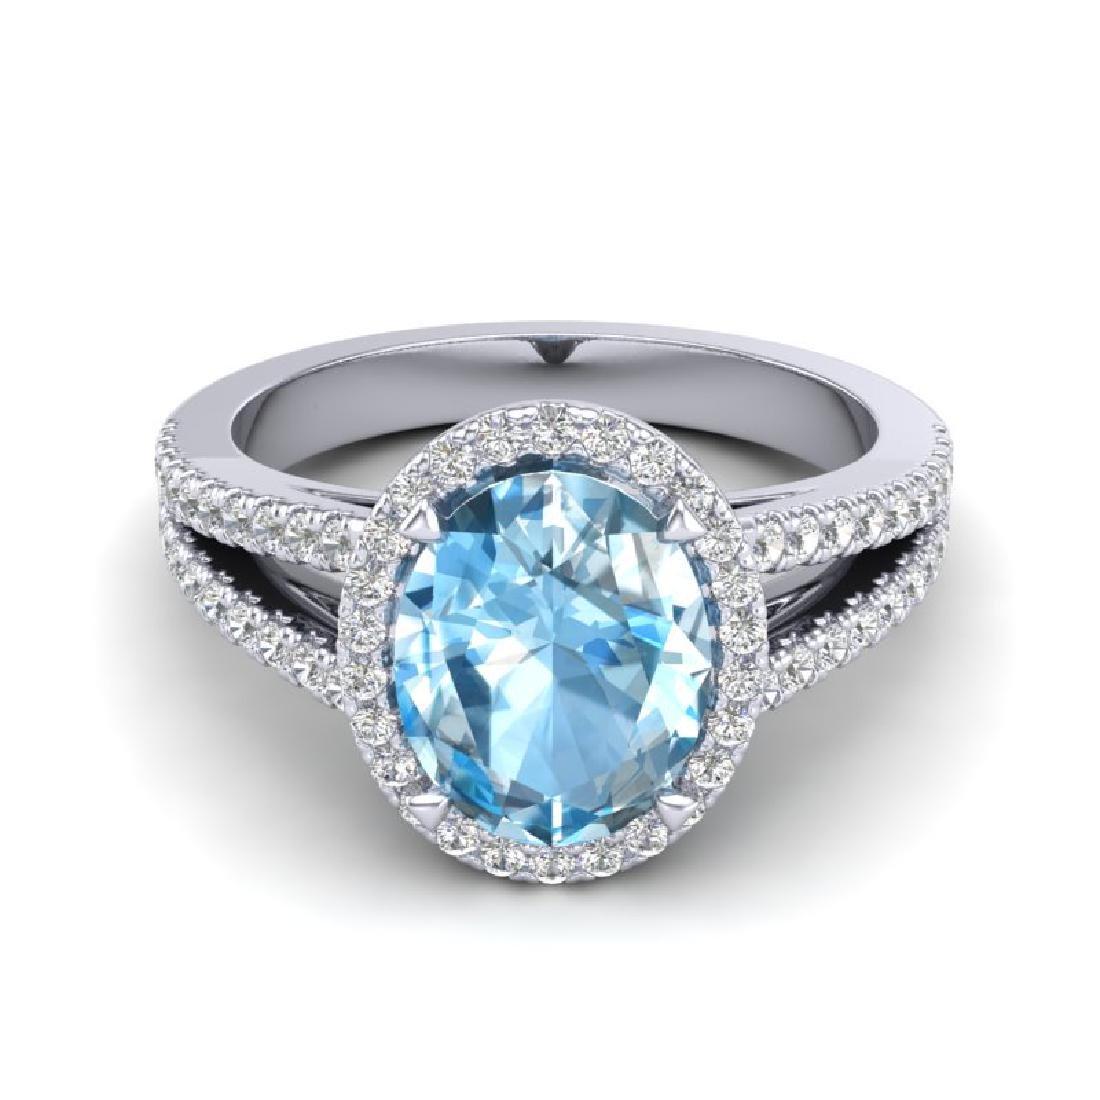 3 Sky Blue Topaz & Micro VS/SI Diamond Halo Solitaire